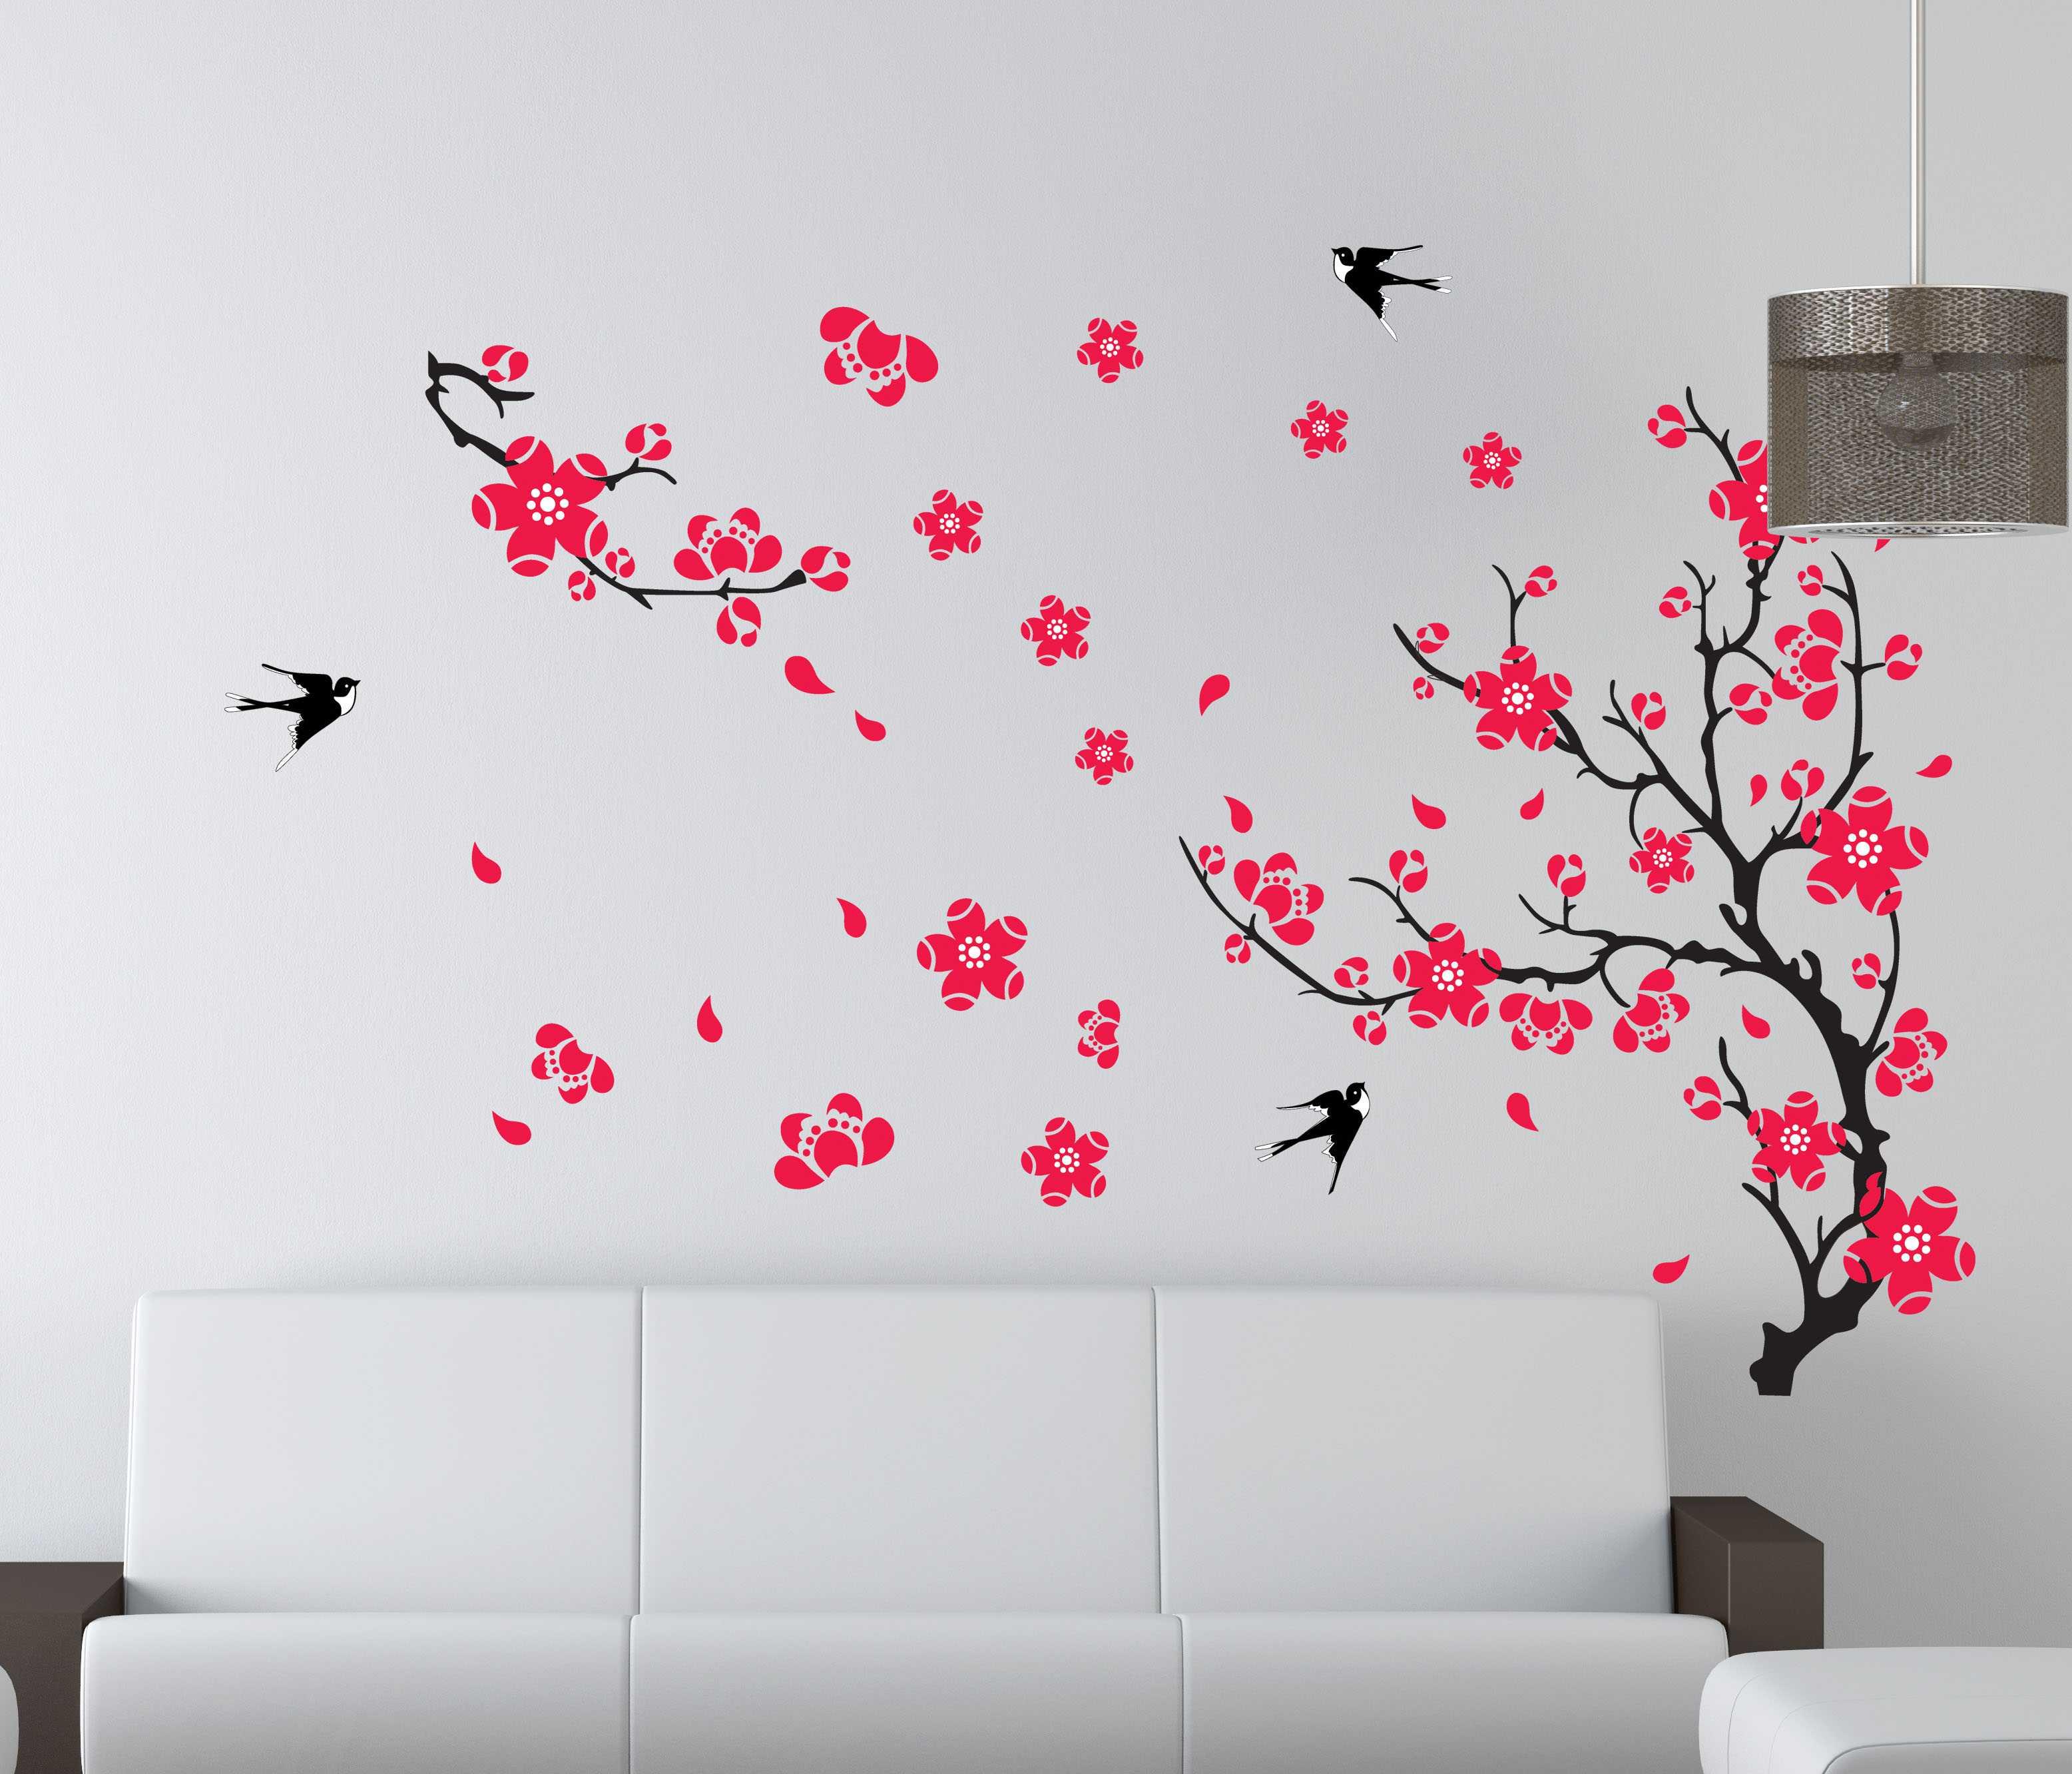 Decor.H 踏雪尋梅 無痕設計壁貼 不傷牆面 展覽 布置 創意 DIY 裝潢 裝飾